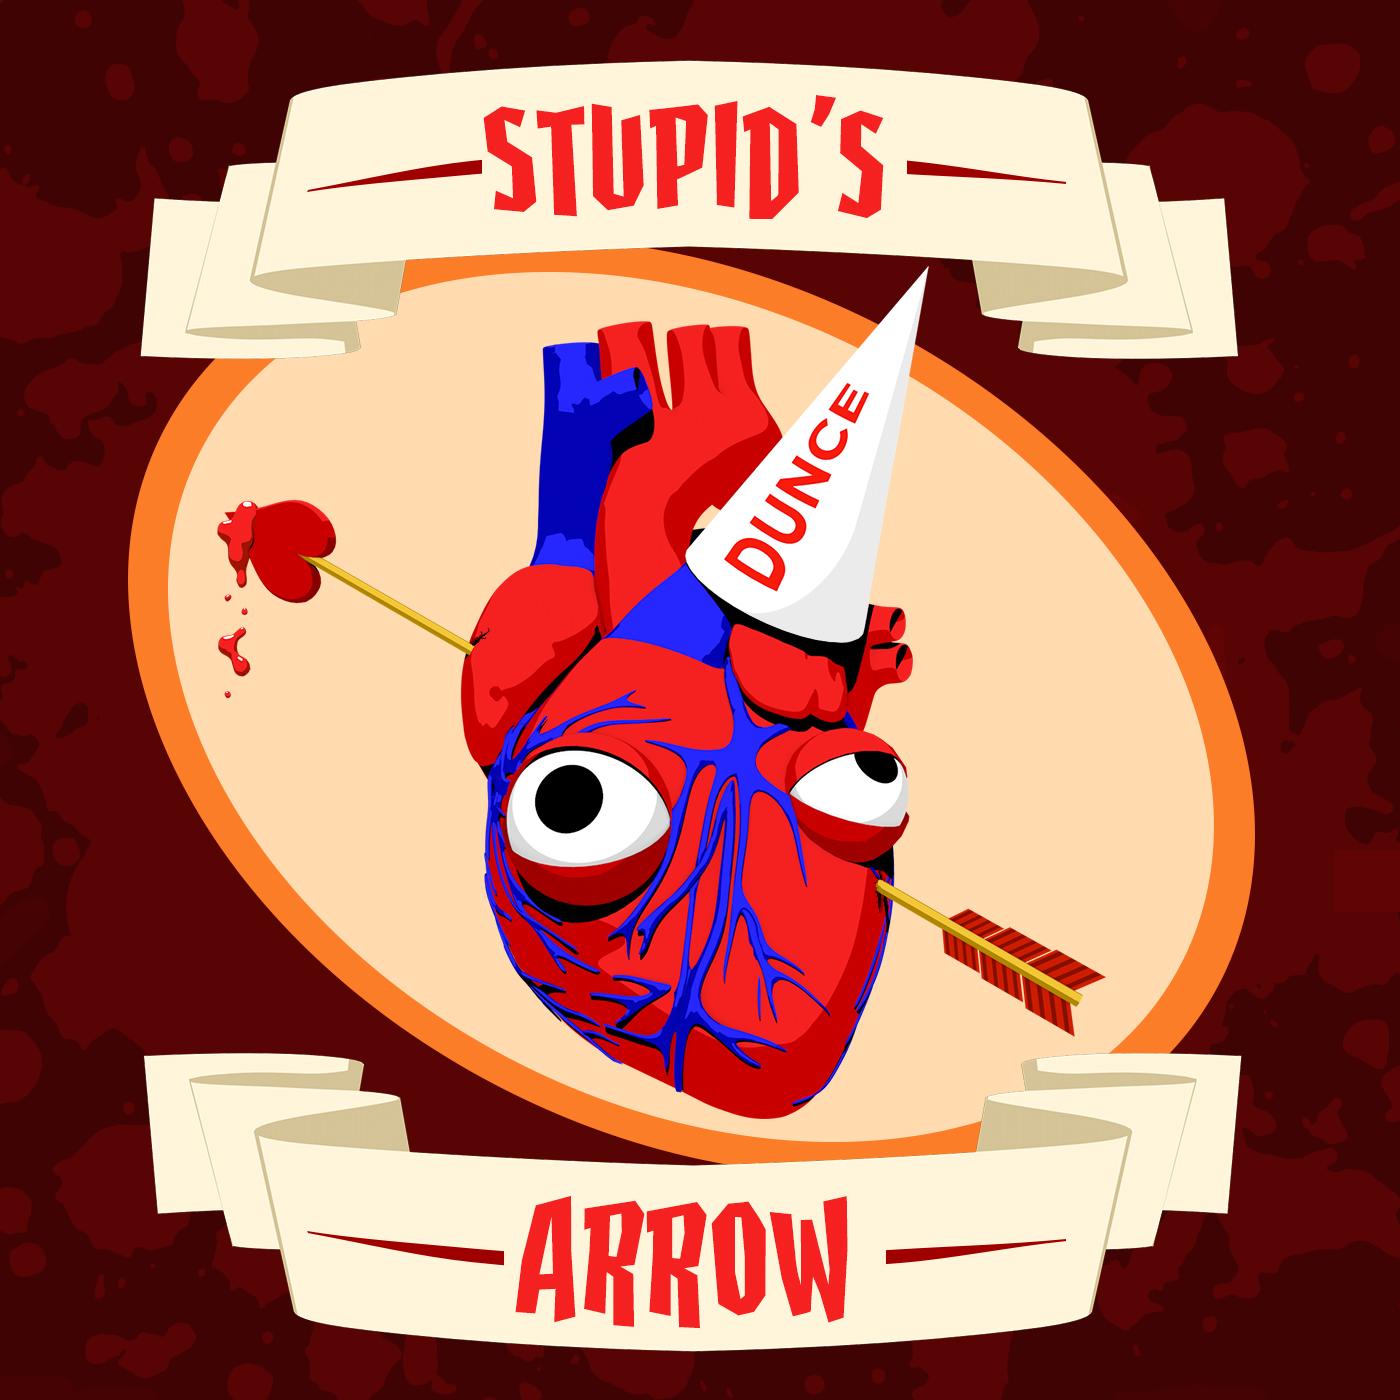 Stupid's Arrow -